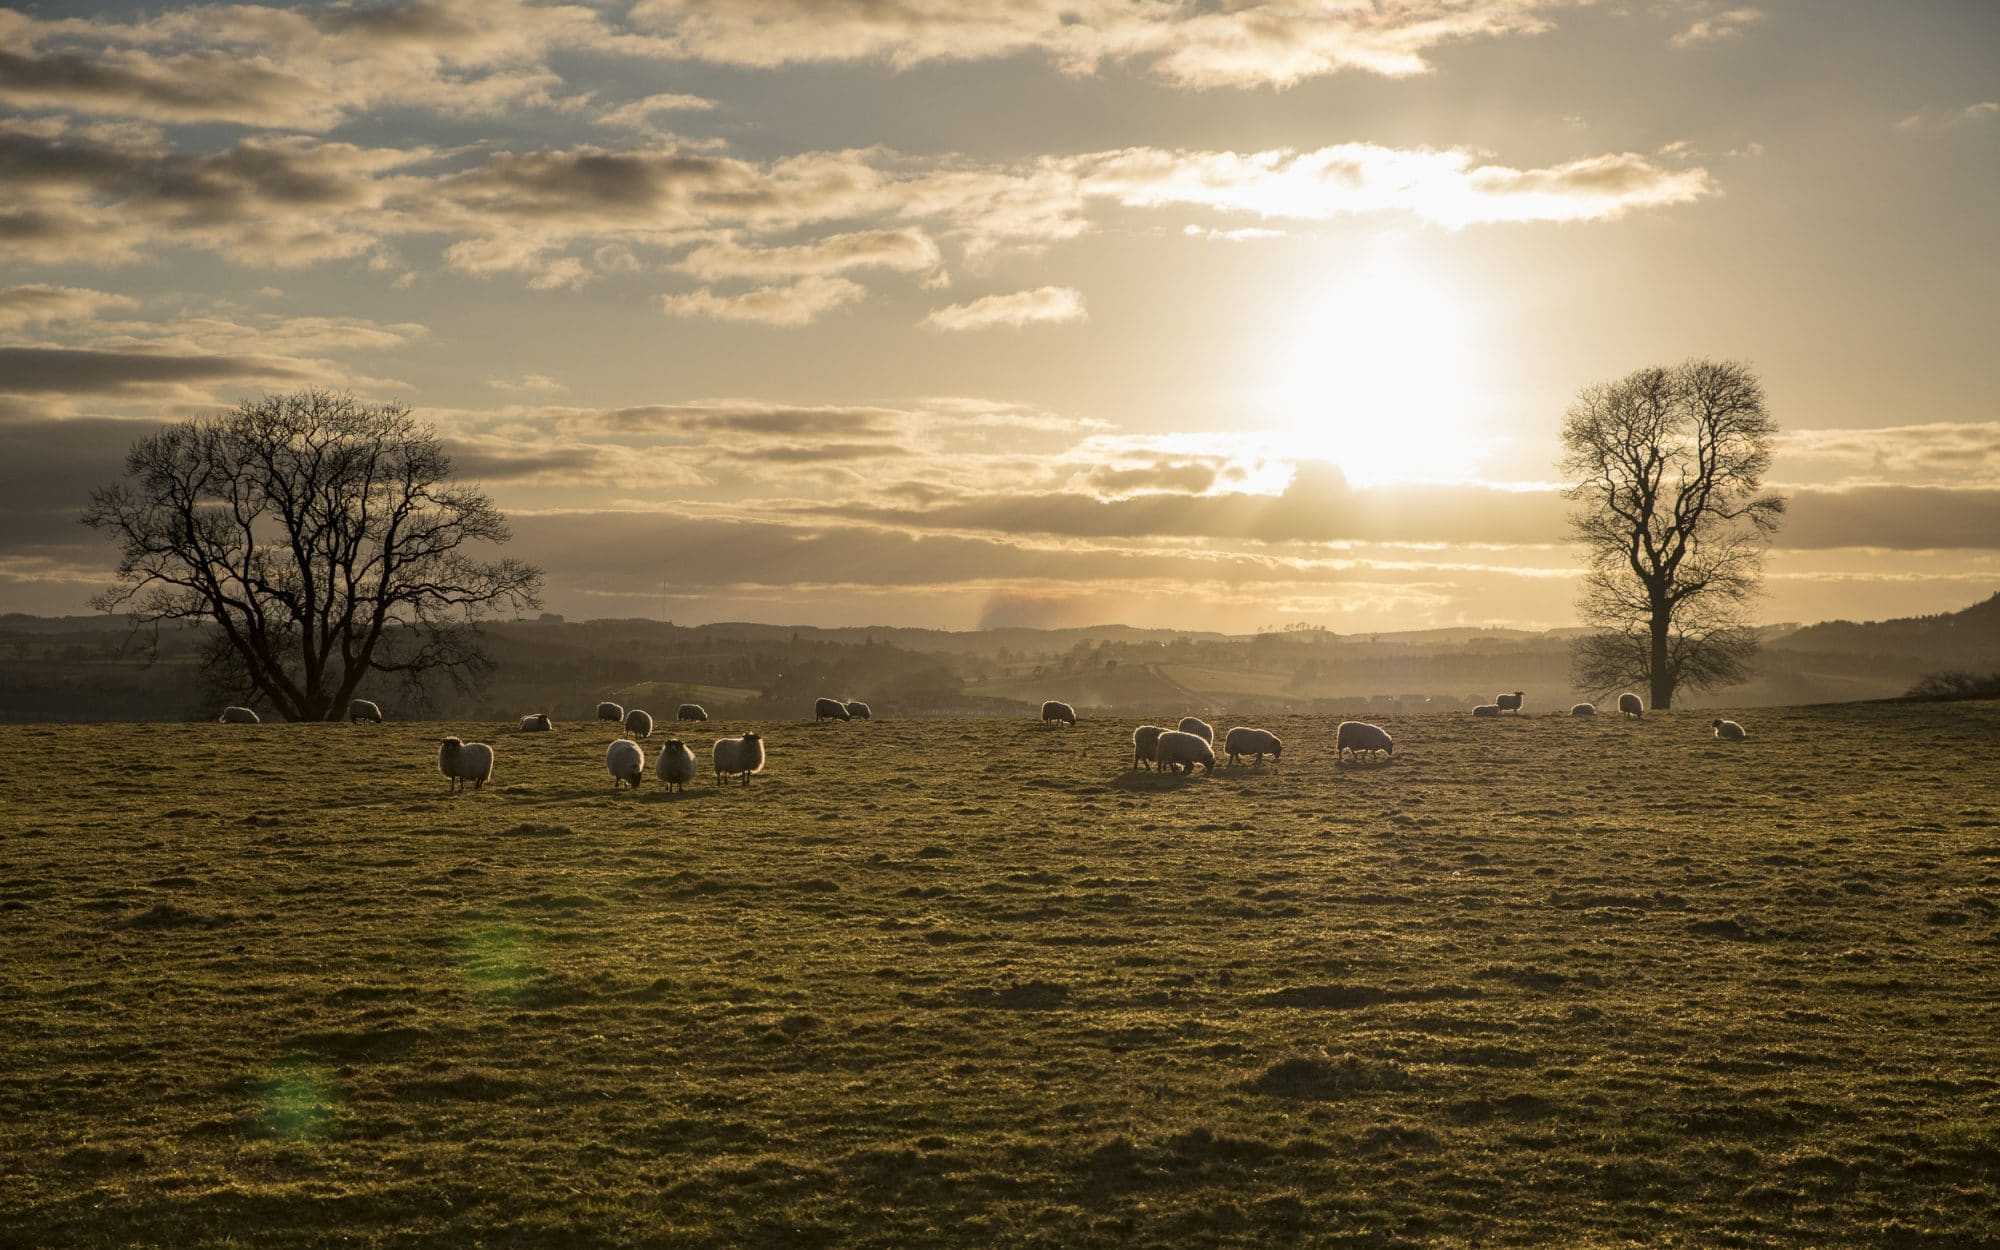 happy-as-a-scottish-sheep-sir-edwards-roadtrip